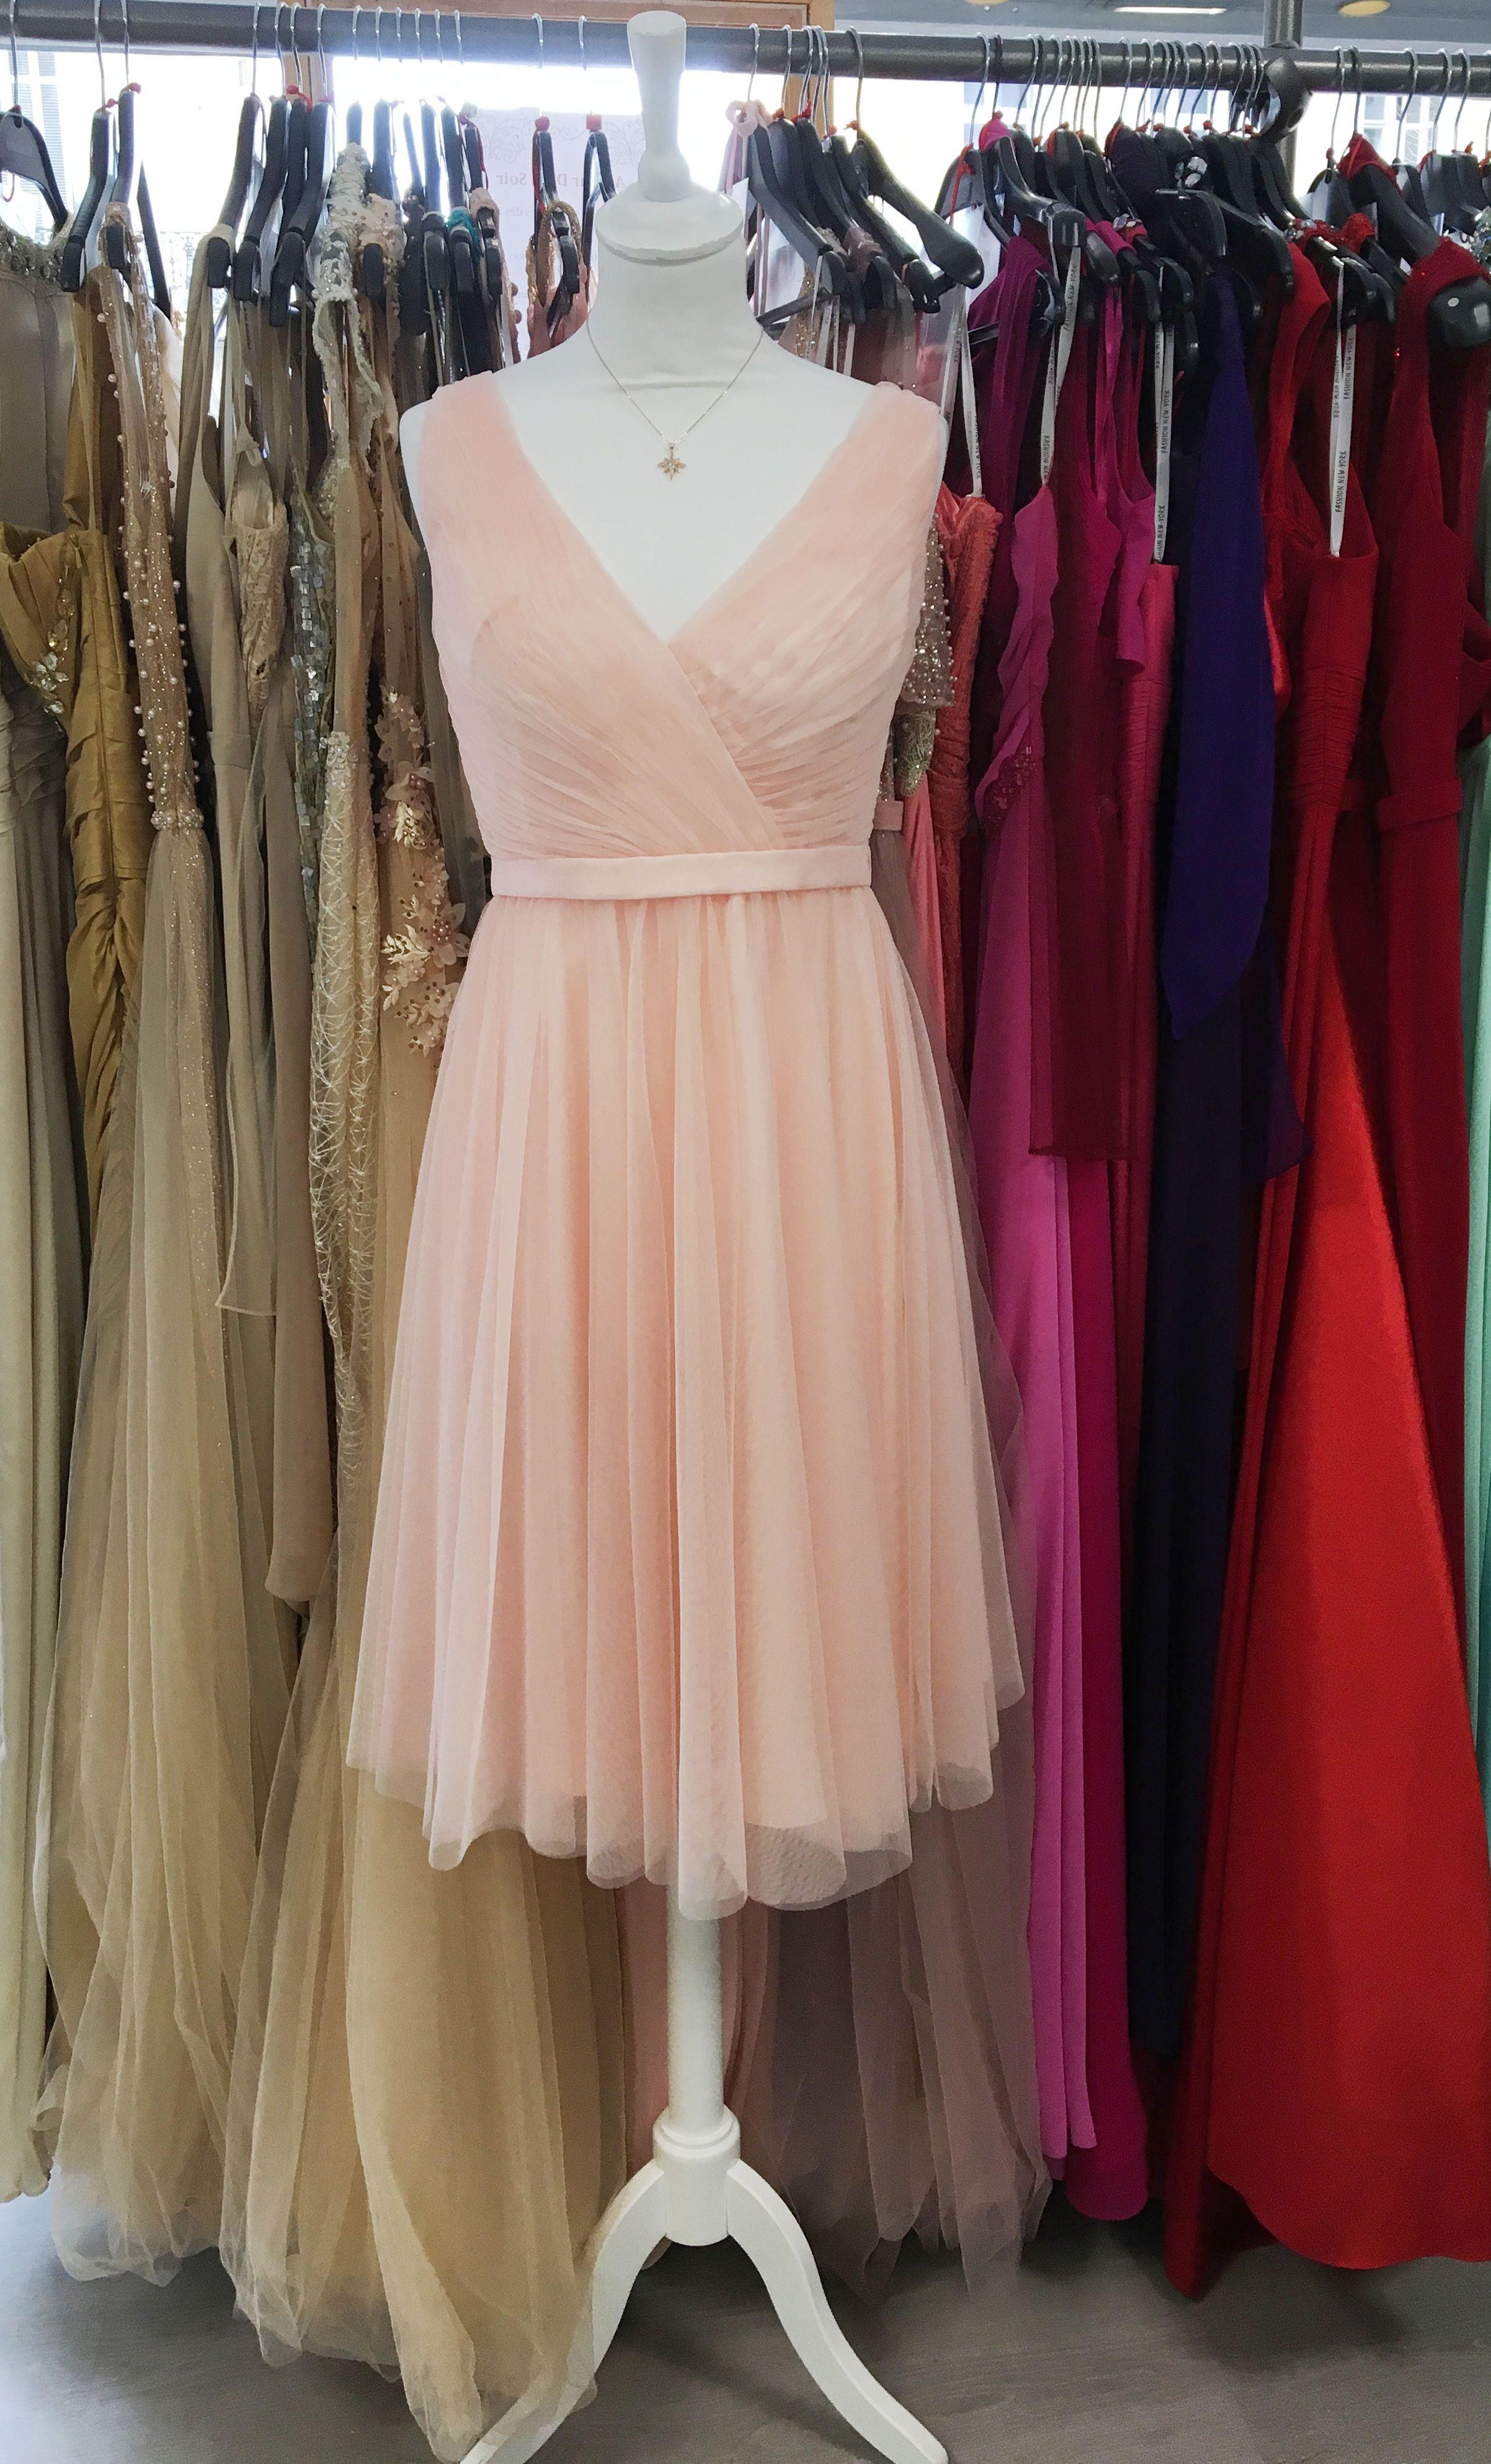 Robe Courte Rose Poudree Tulle Et Decollete V Style Danseuse Mi